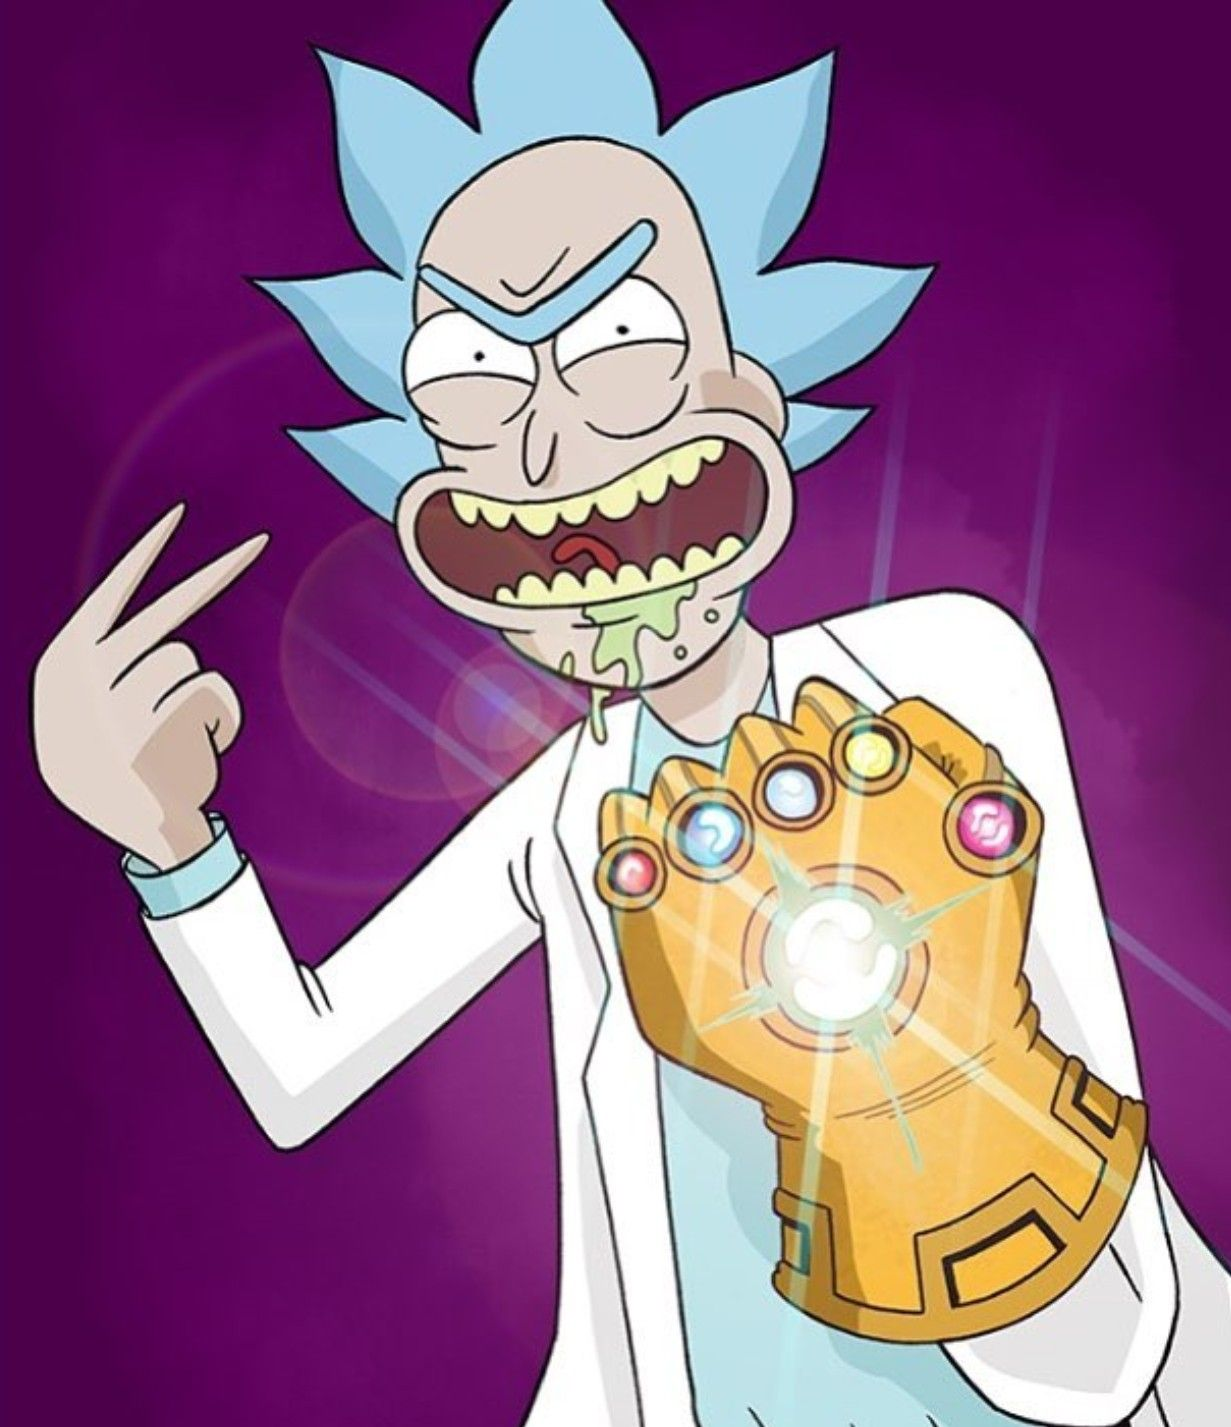 Rick and Morty x Infinity War | Rick and Morty | Rick ...